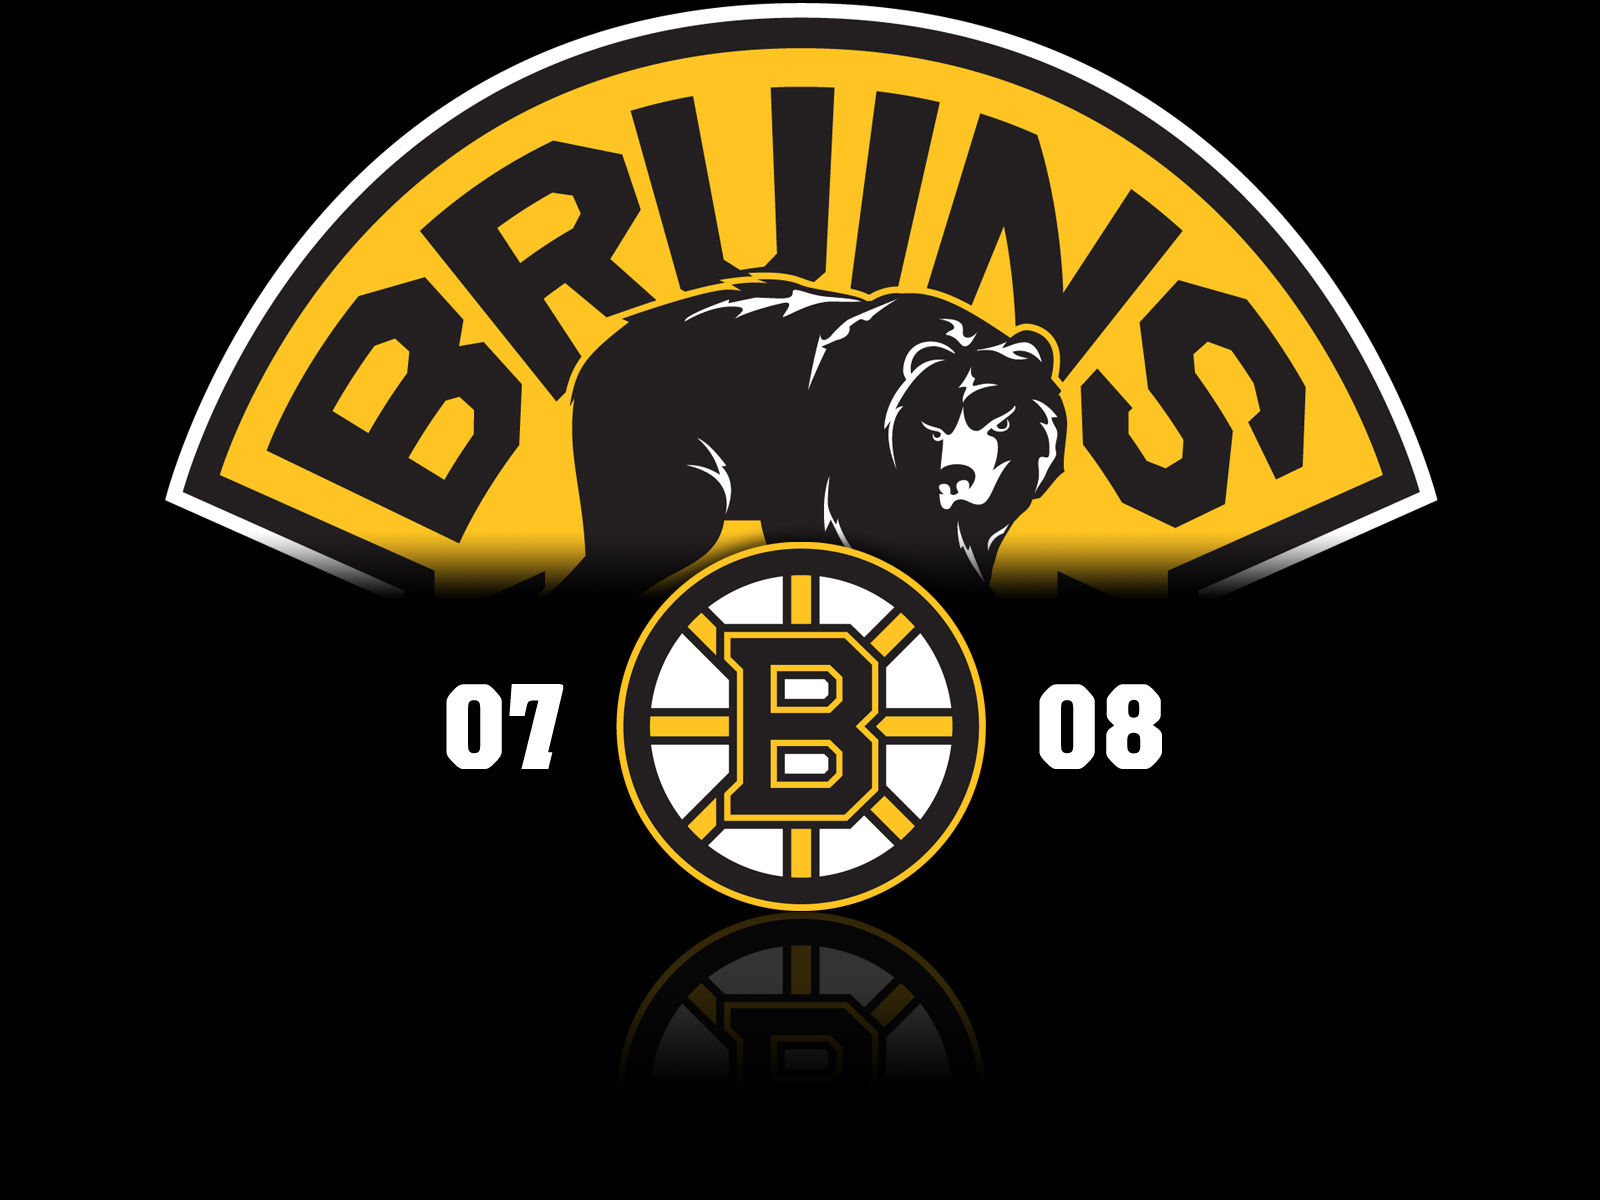 Hockey Boston Bruins j wallpaper 1600x1200 128648 WallpaperUP